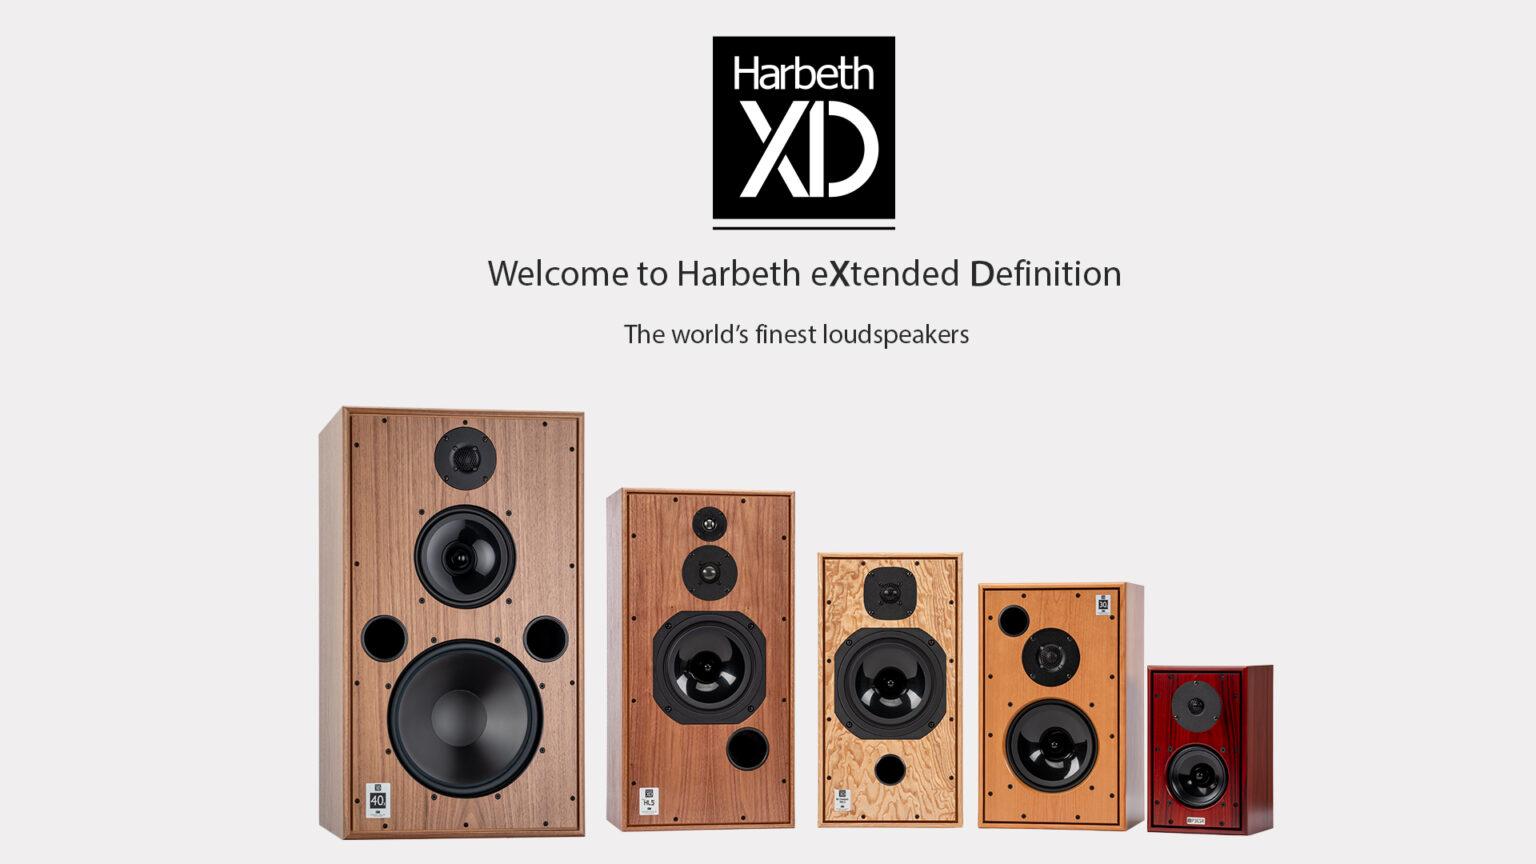 harbeth.co.uk